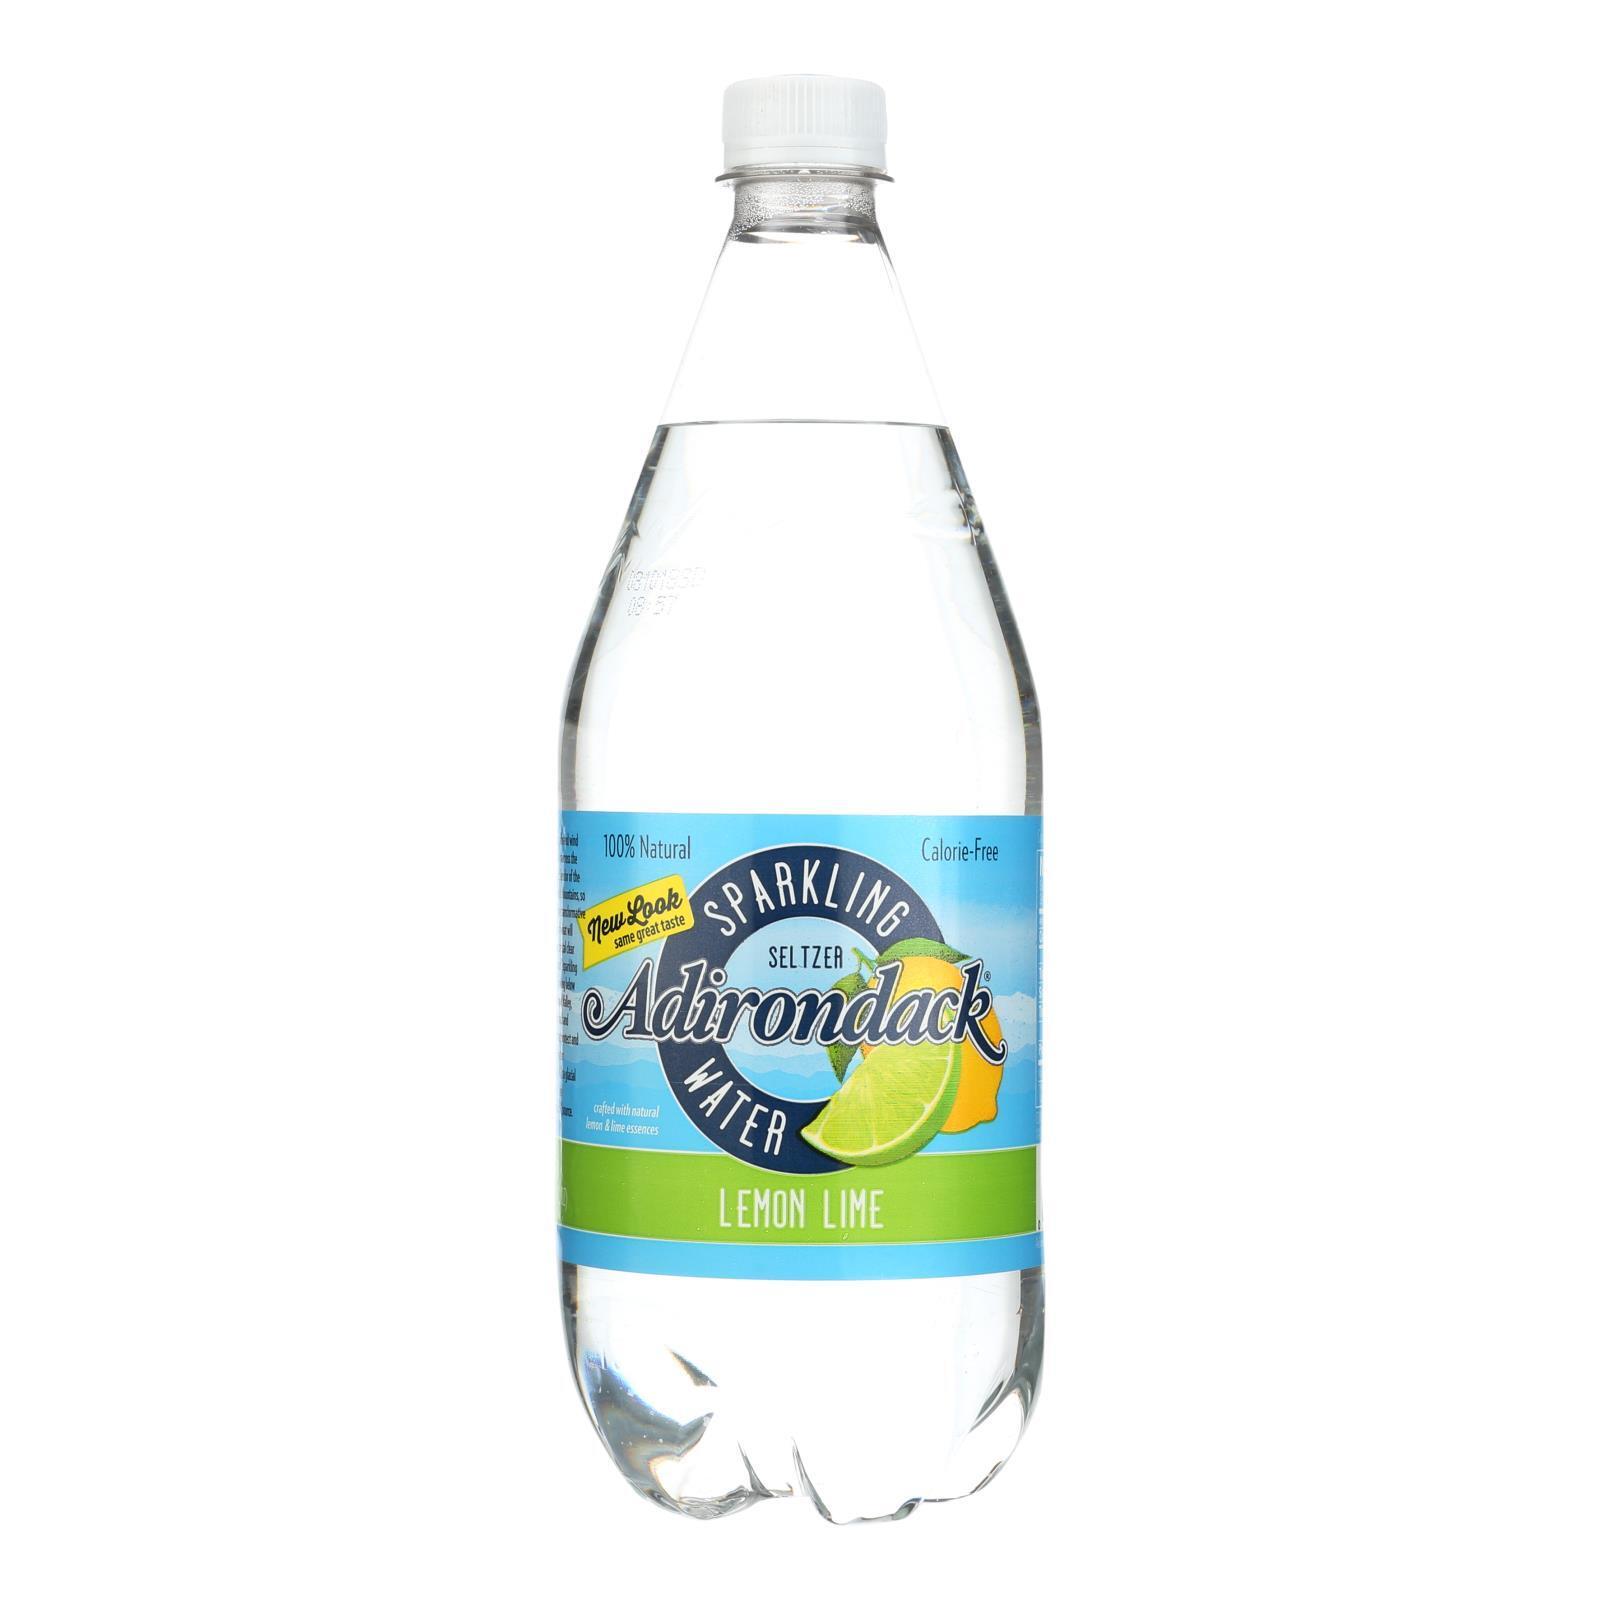 Naturals Adirondack Seltzer - Lemon Lime - Case of 12 - 33.8 Fl oz.